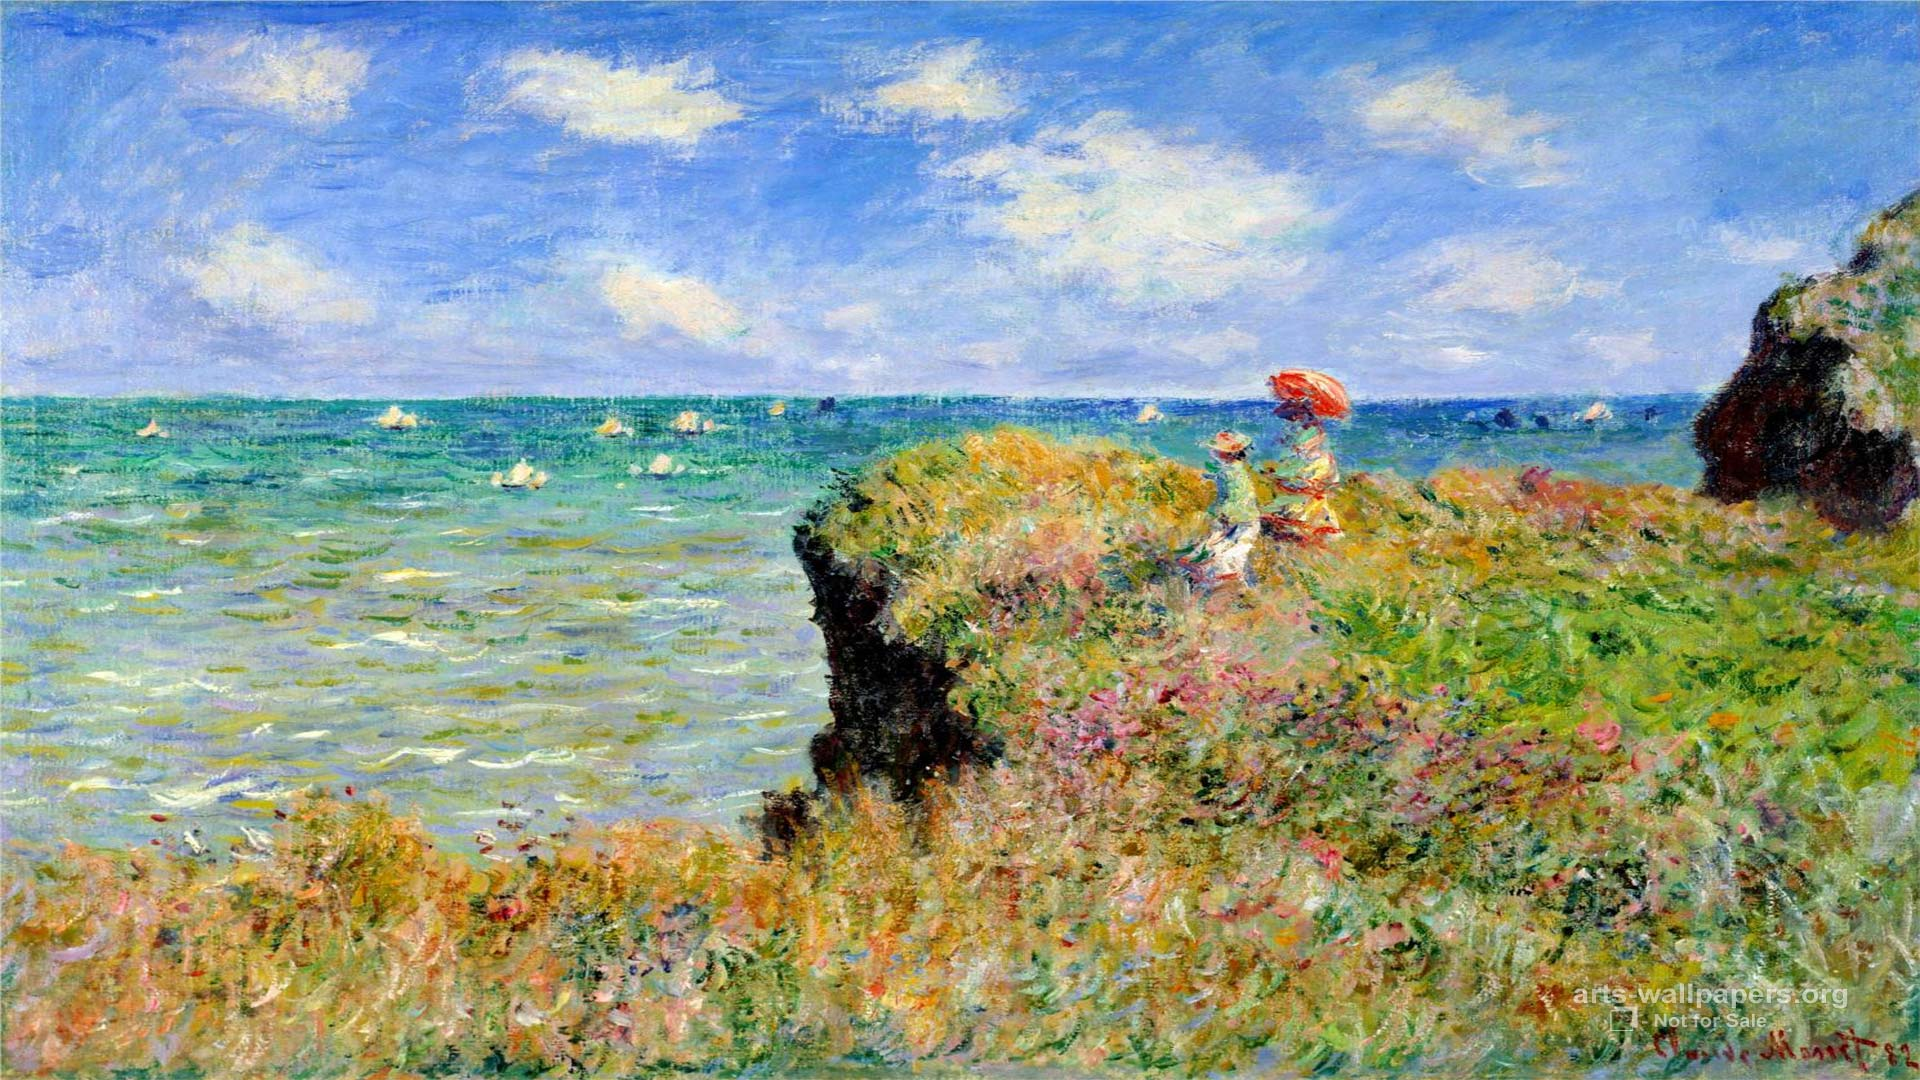 Claude Monet Wallpaper Paintings Desktop Art Backgrounds 1920x1080